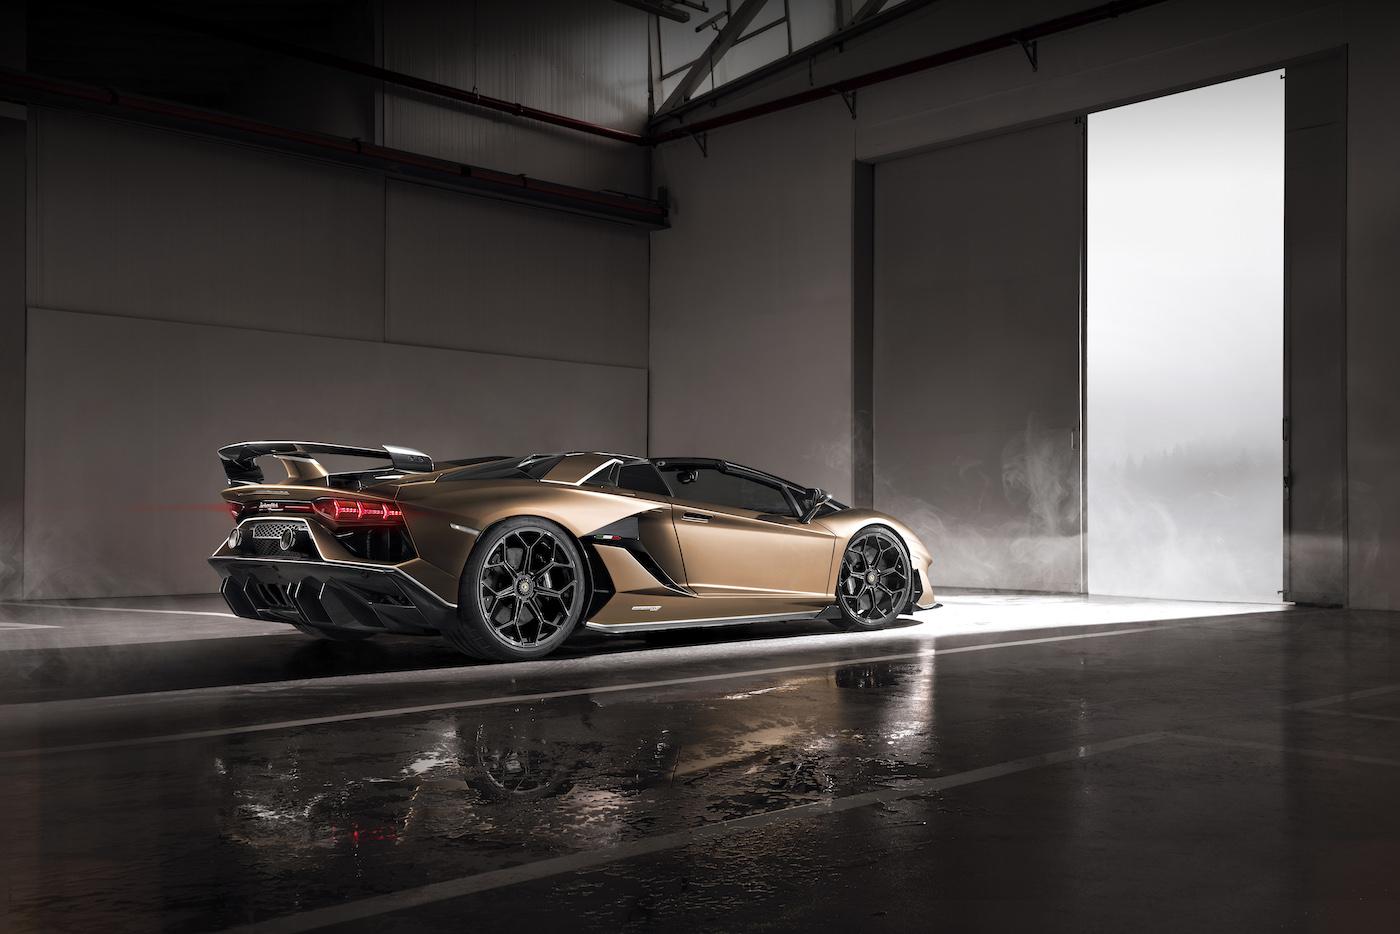 Oben ohne mit 350 km/h: Lamborghini präsentiert den Aventador SVJ Roadster in Genf 16